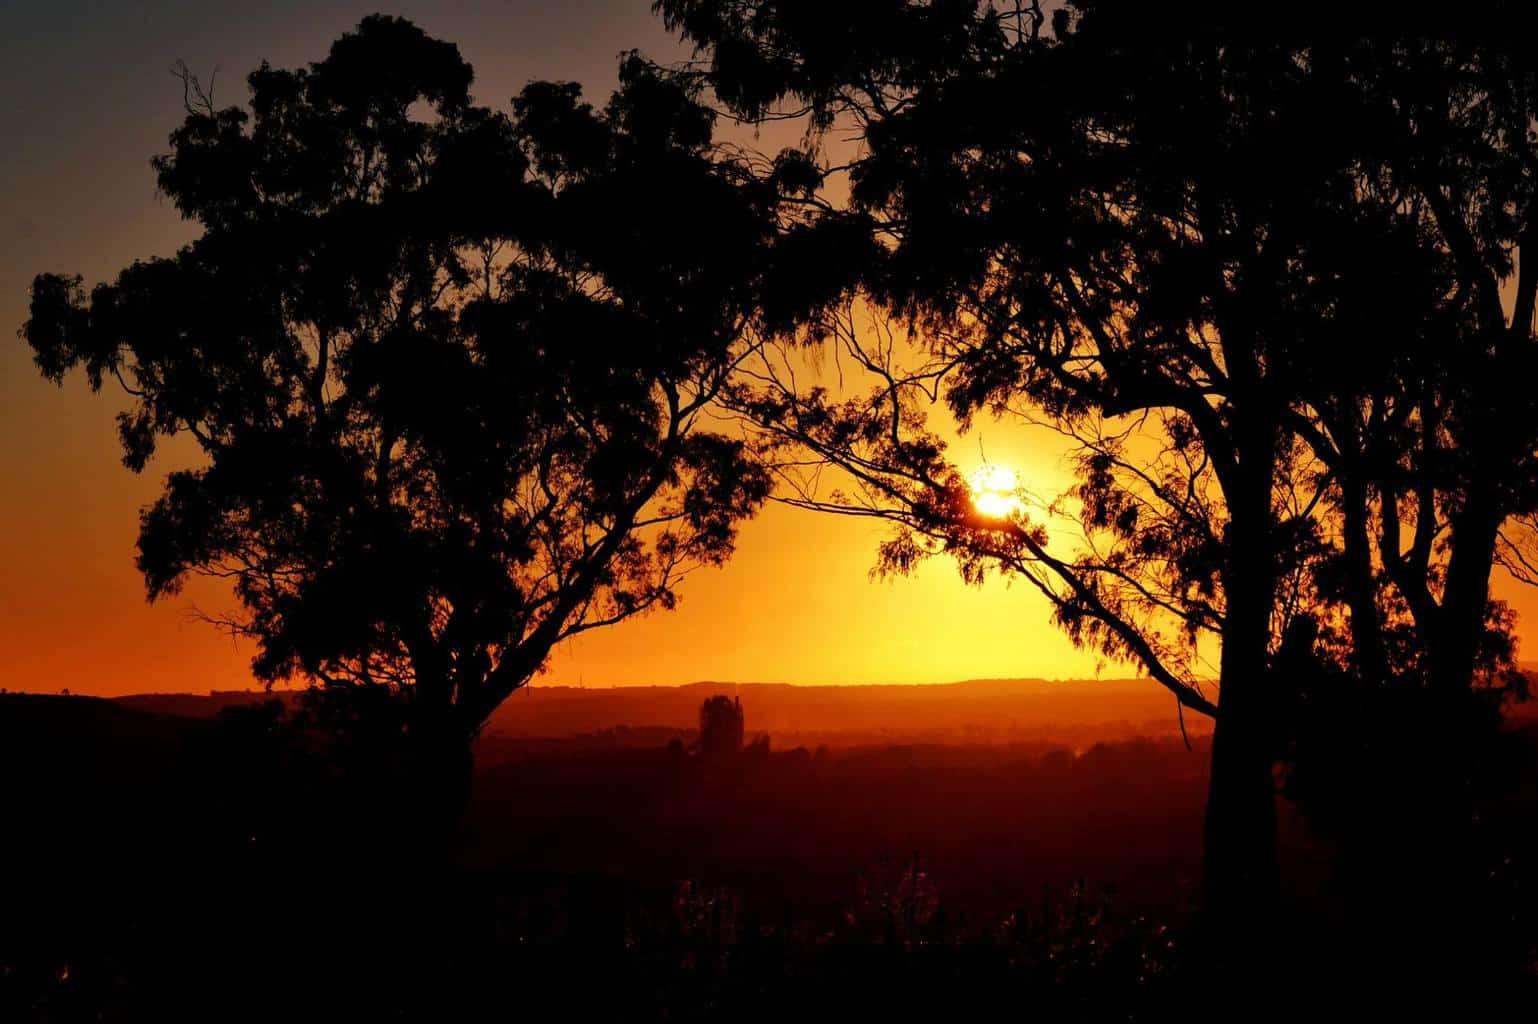 Sunset at 800m above sea level - Southern Highlands, Australia